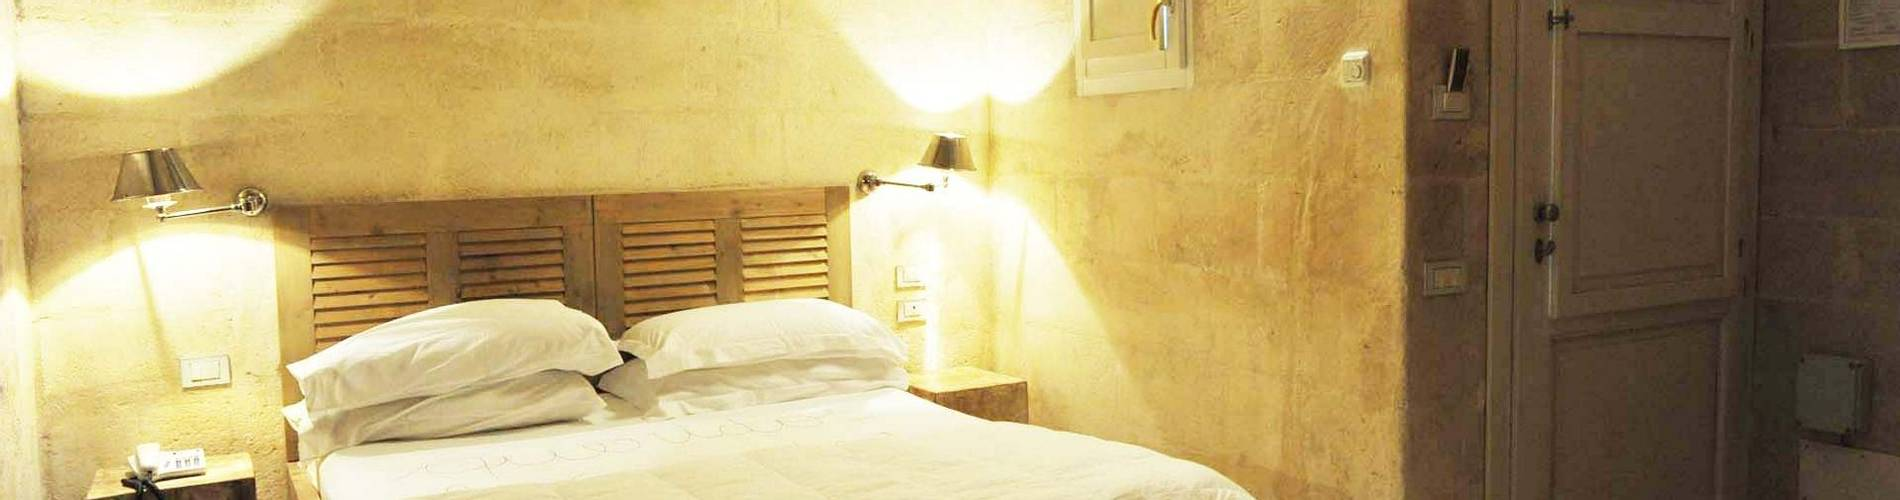 L'Hotel In Pietra, Basilicata, Italy, Standard 1006 (4).jpg